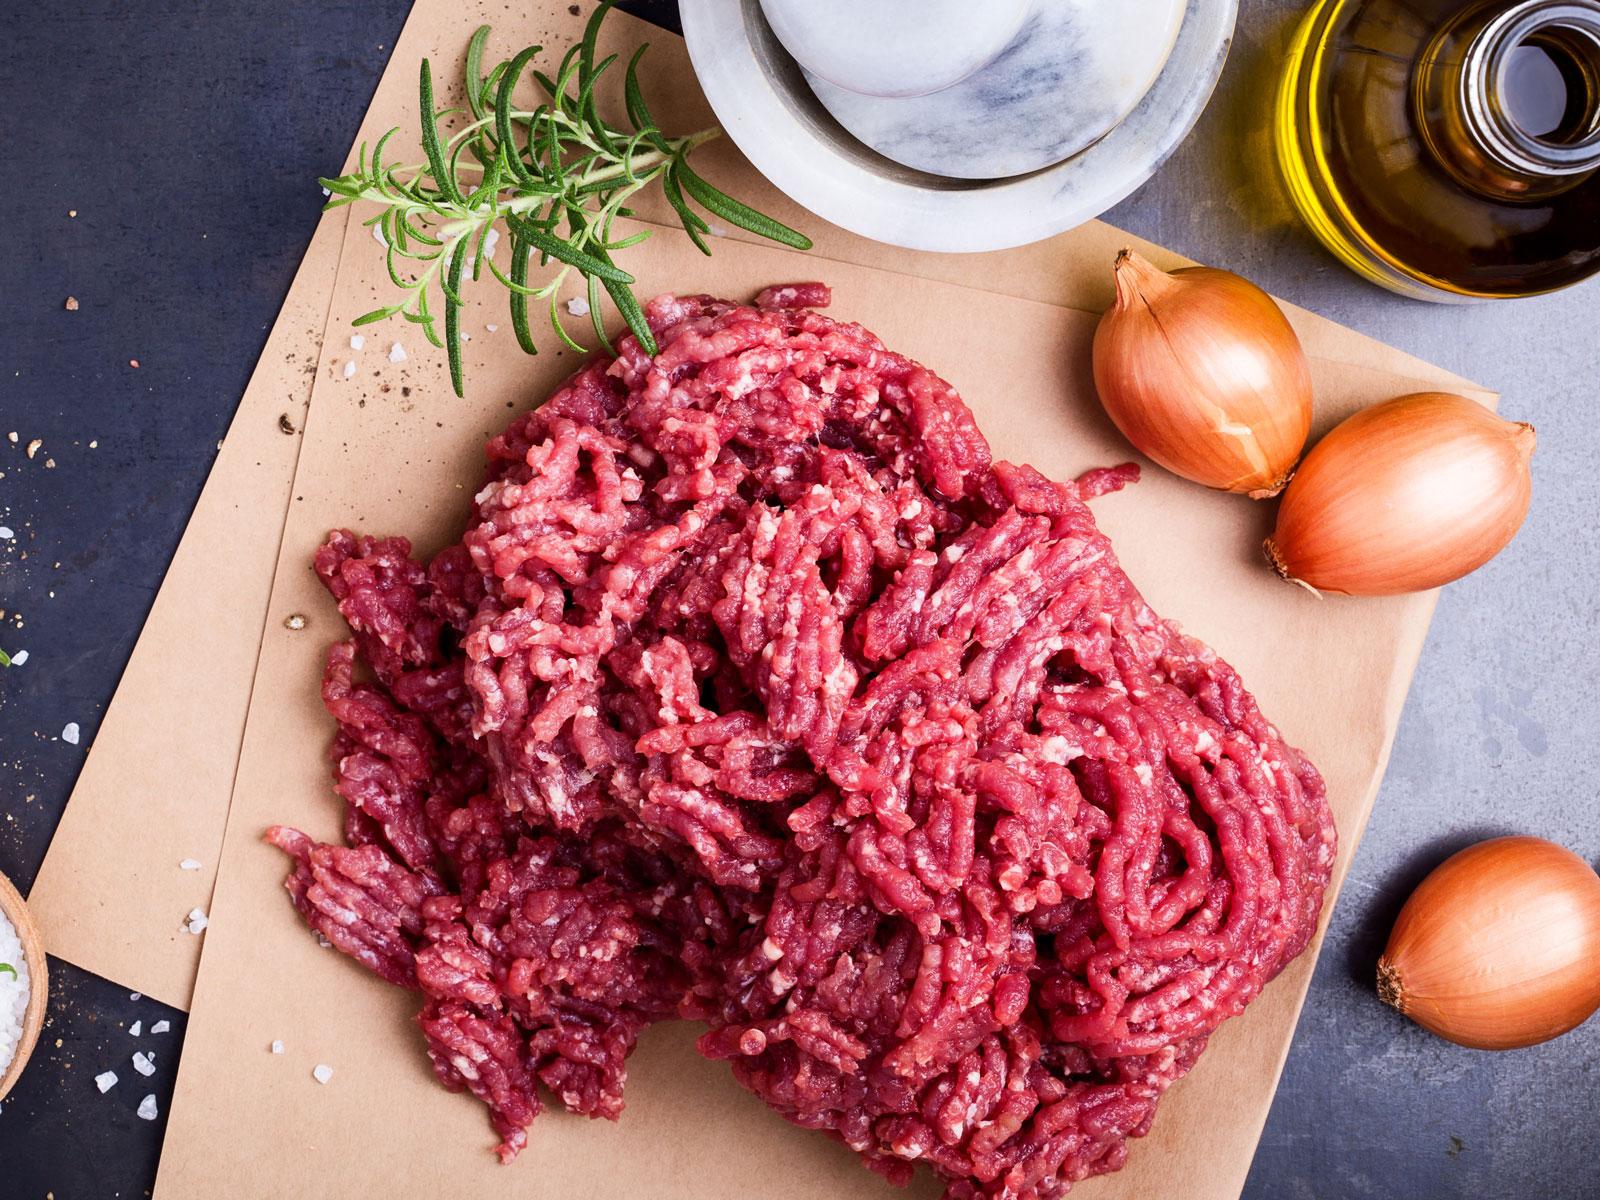 CDC Ground Beef Warning